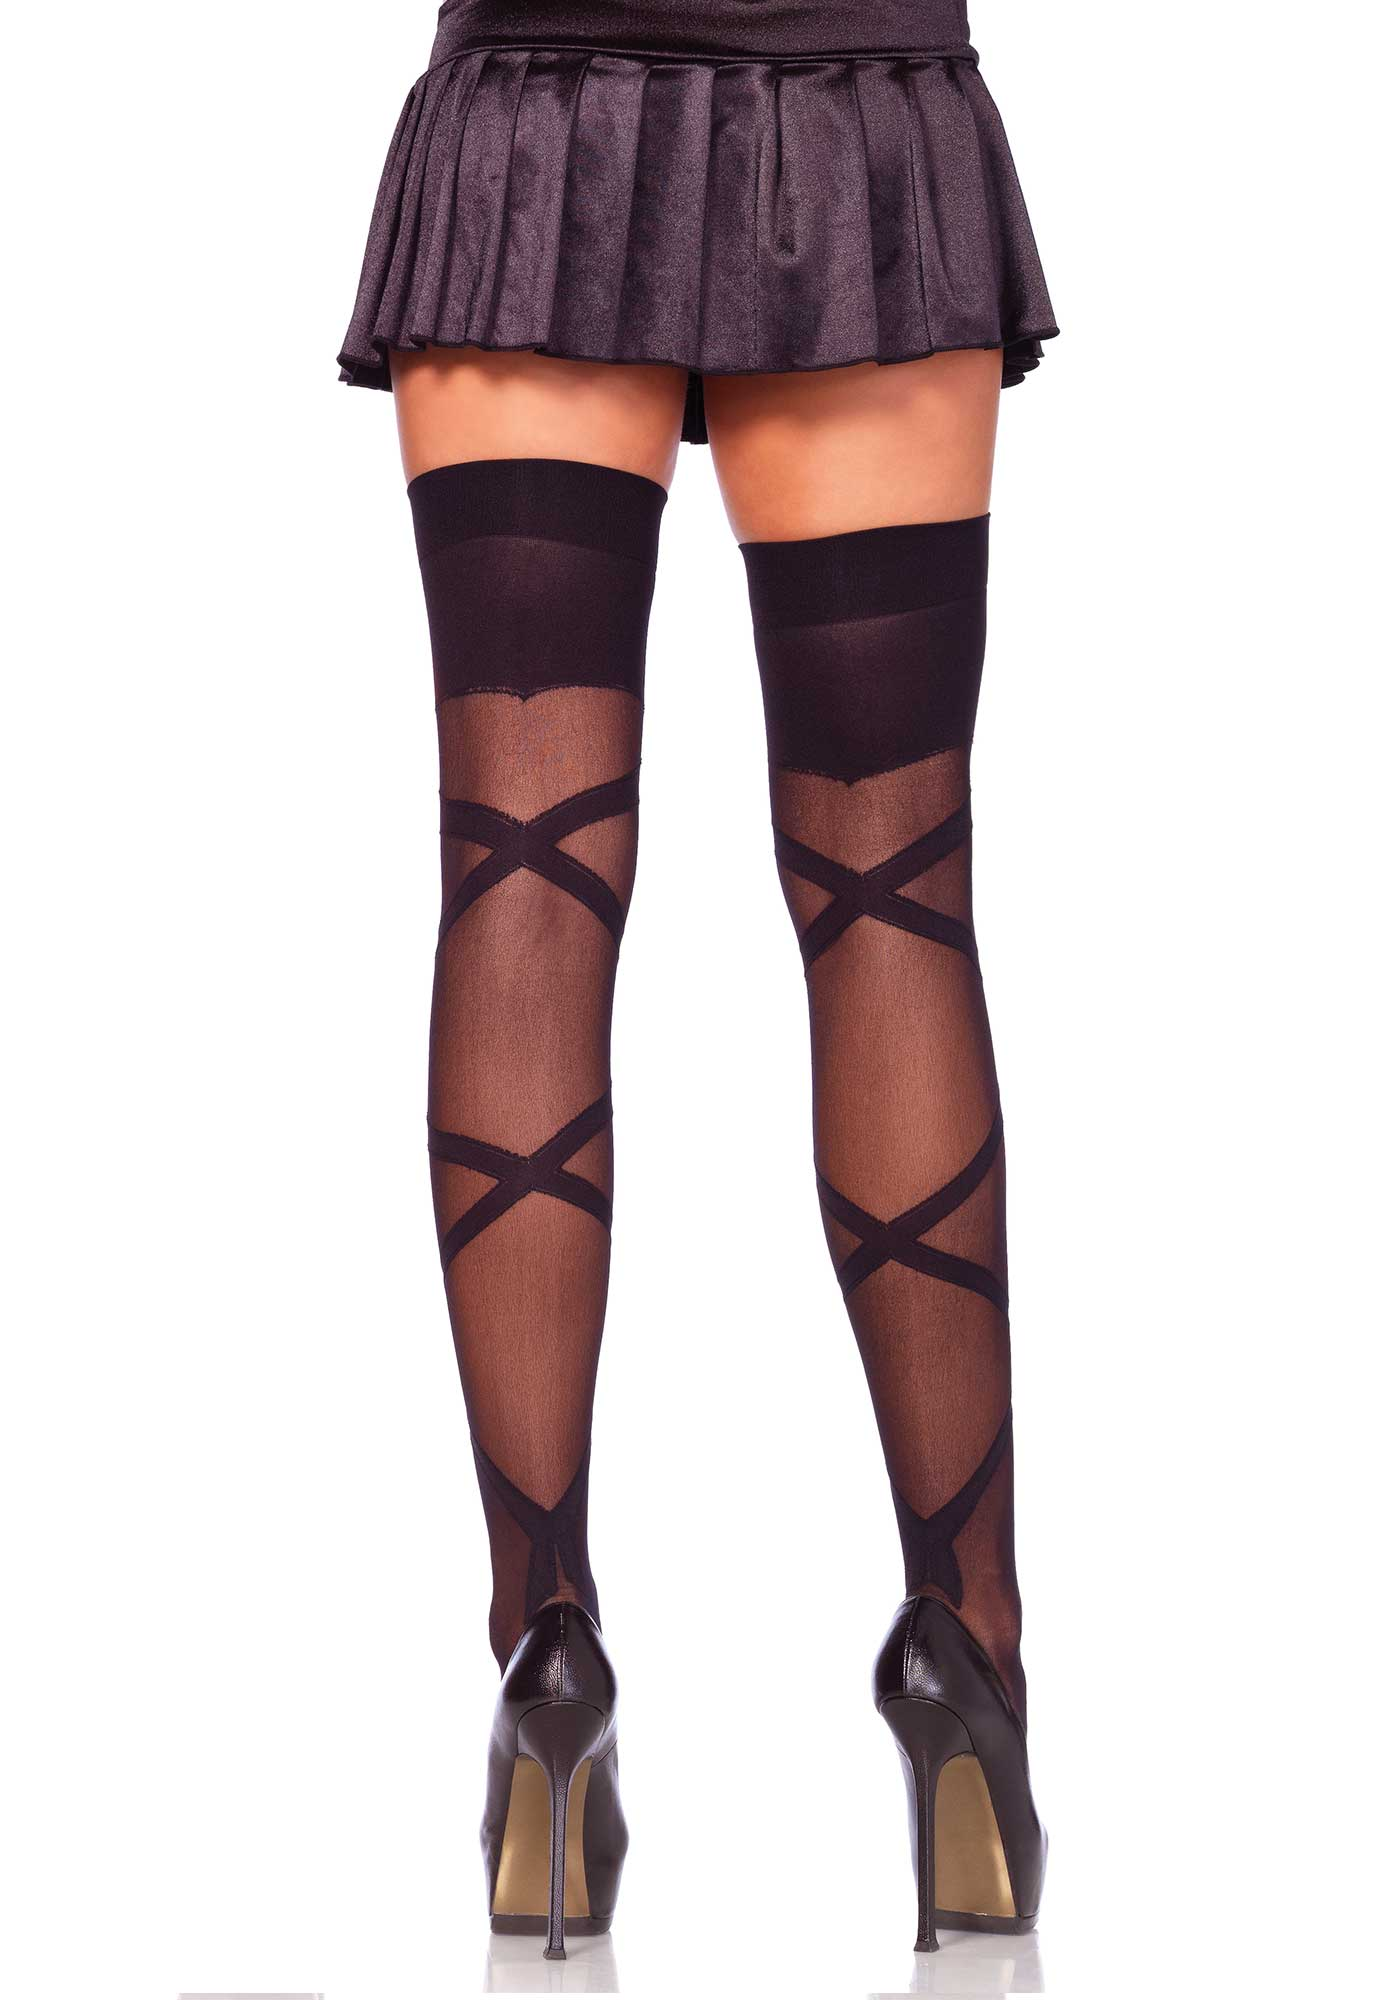 Criss Cross Stockings